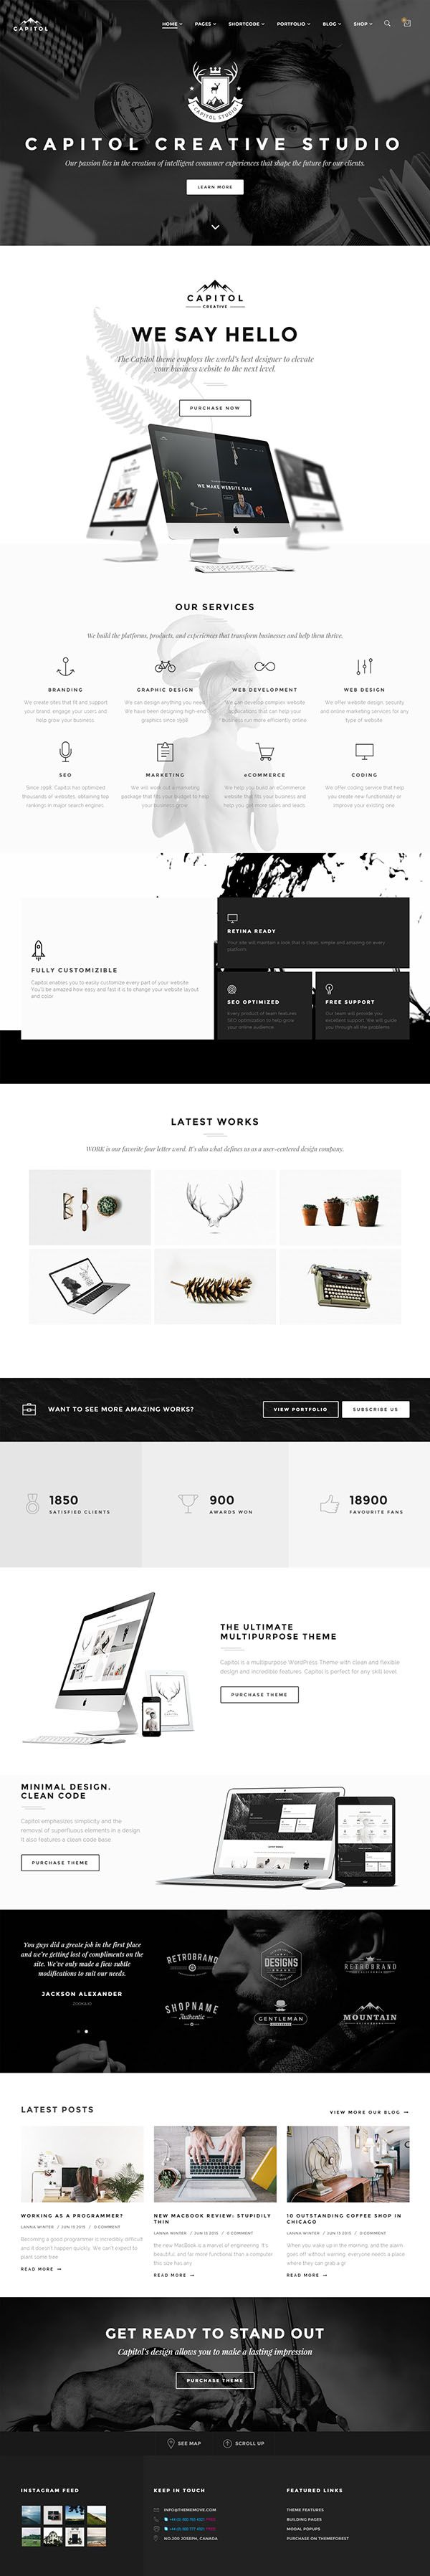 890 best web design images on pinterest page layout design web capitol creative multi purpose wordpress theme fandeluxe Images